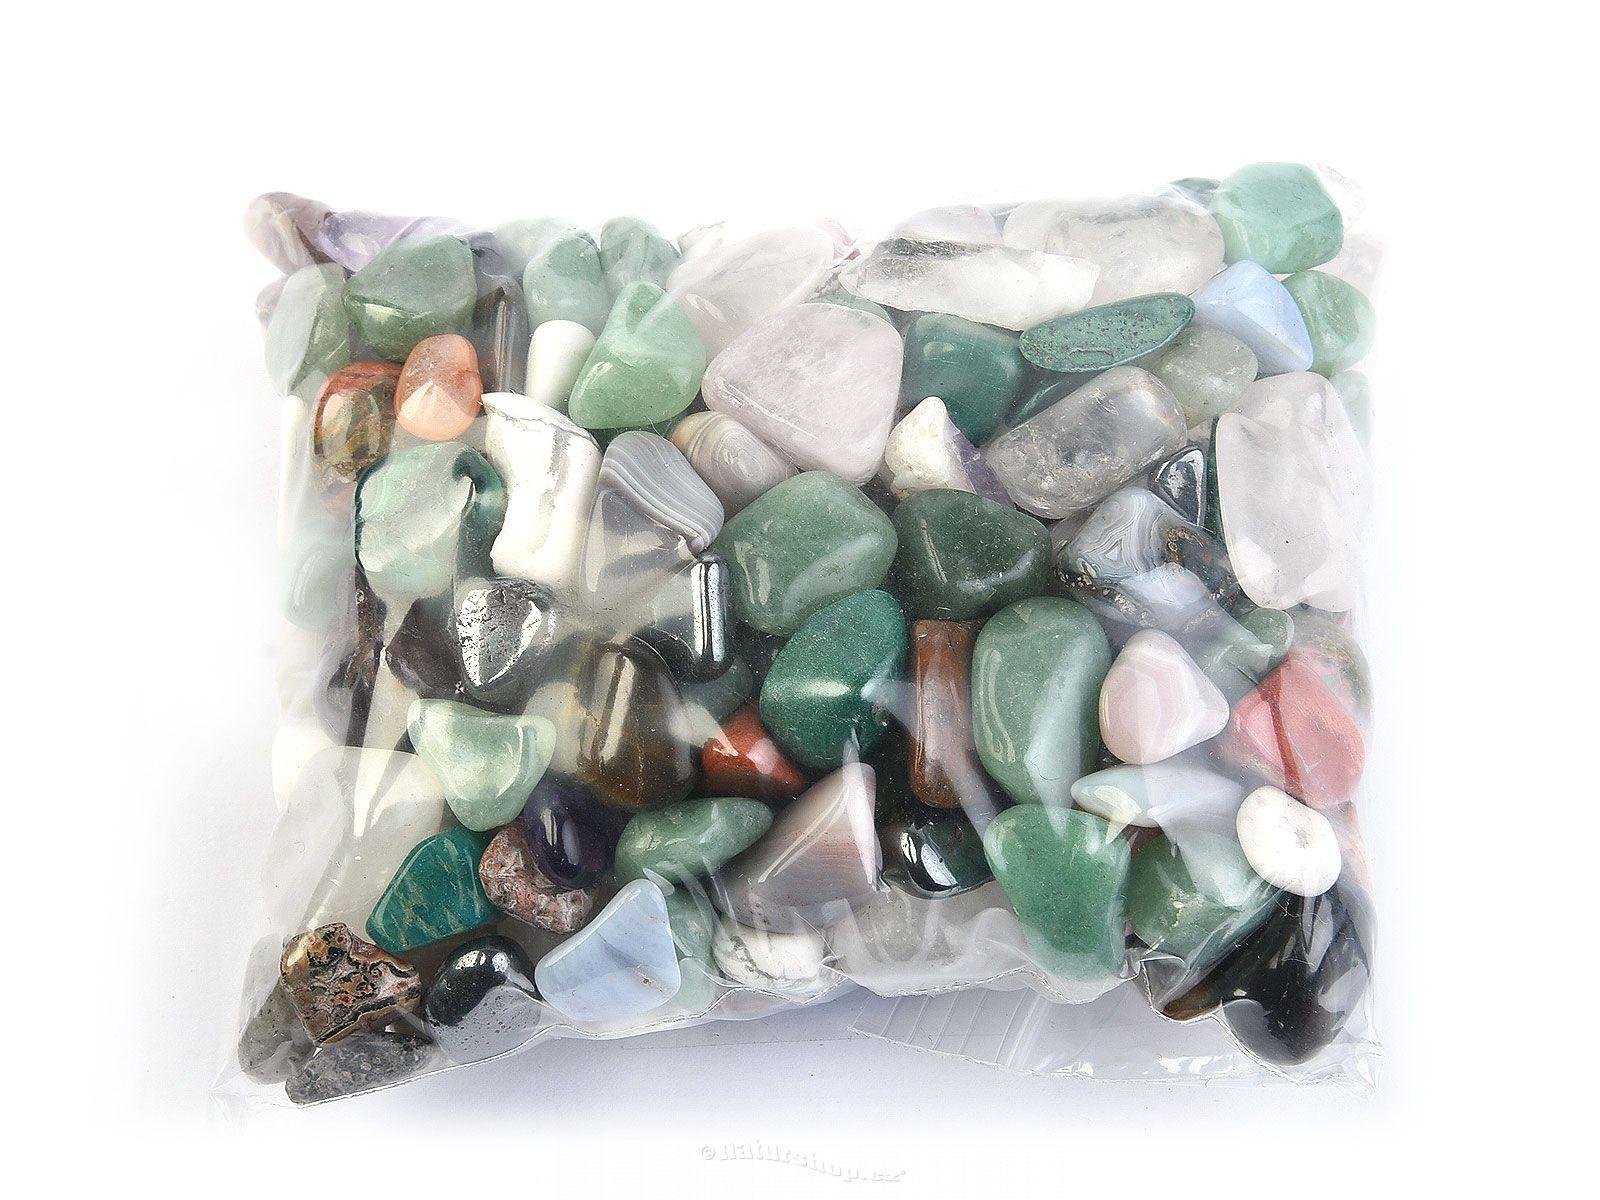 884c645bd99c65 Combination of stone packing 500g - naturshop.cz